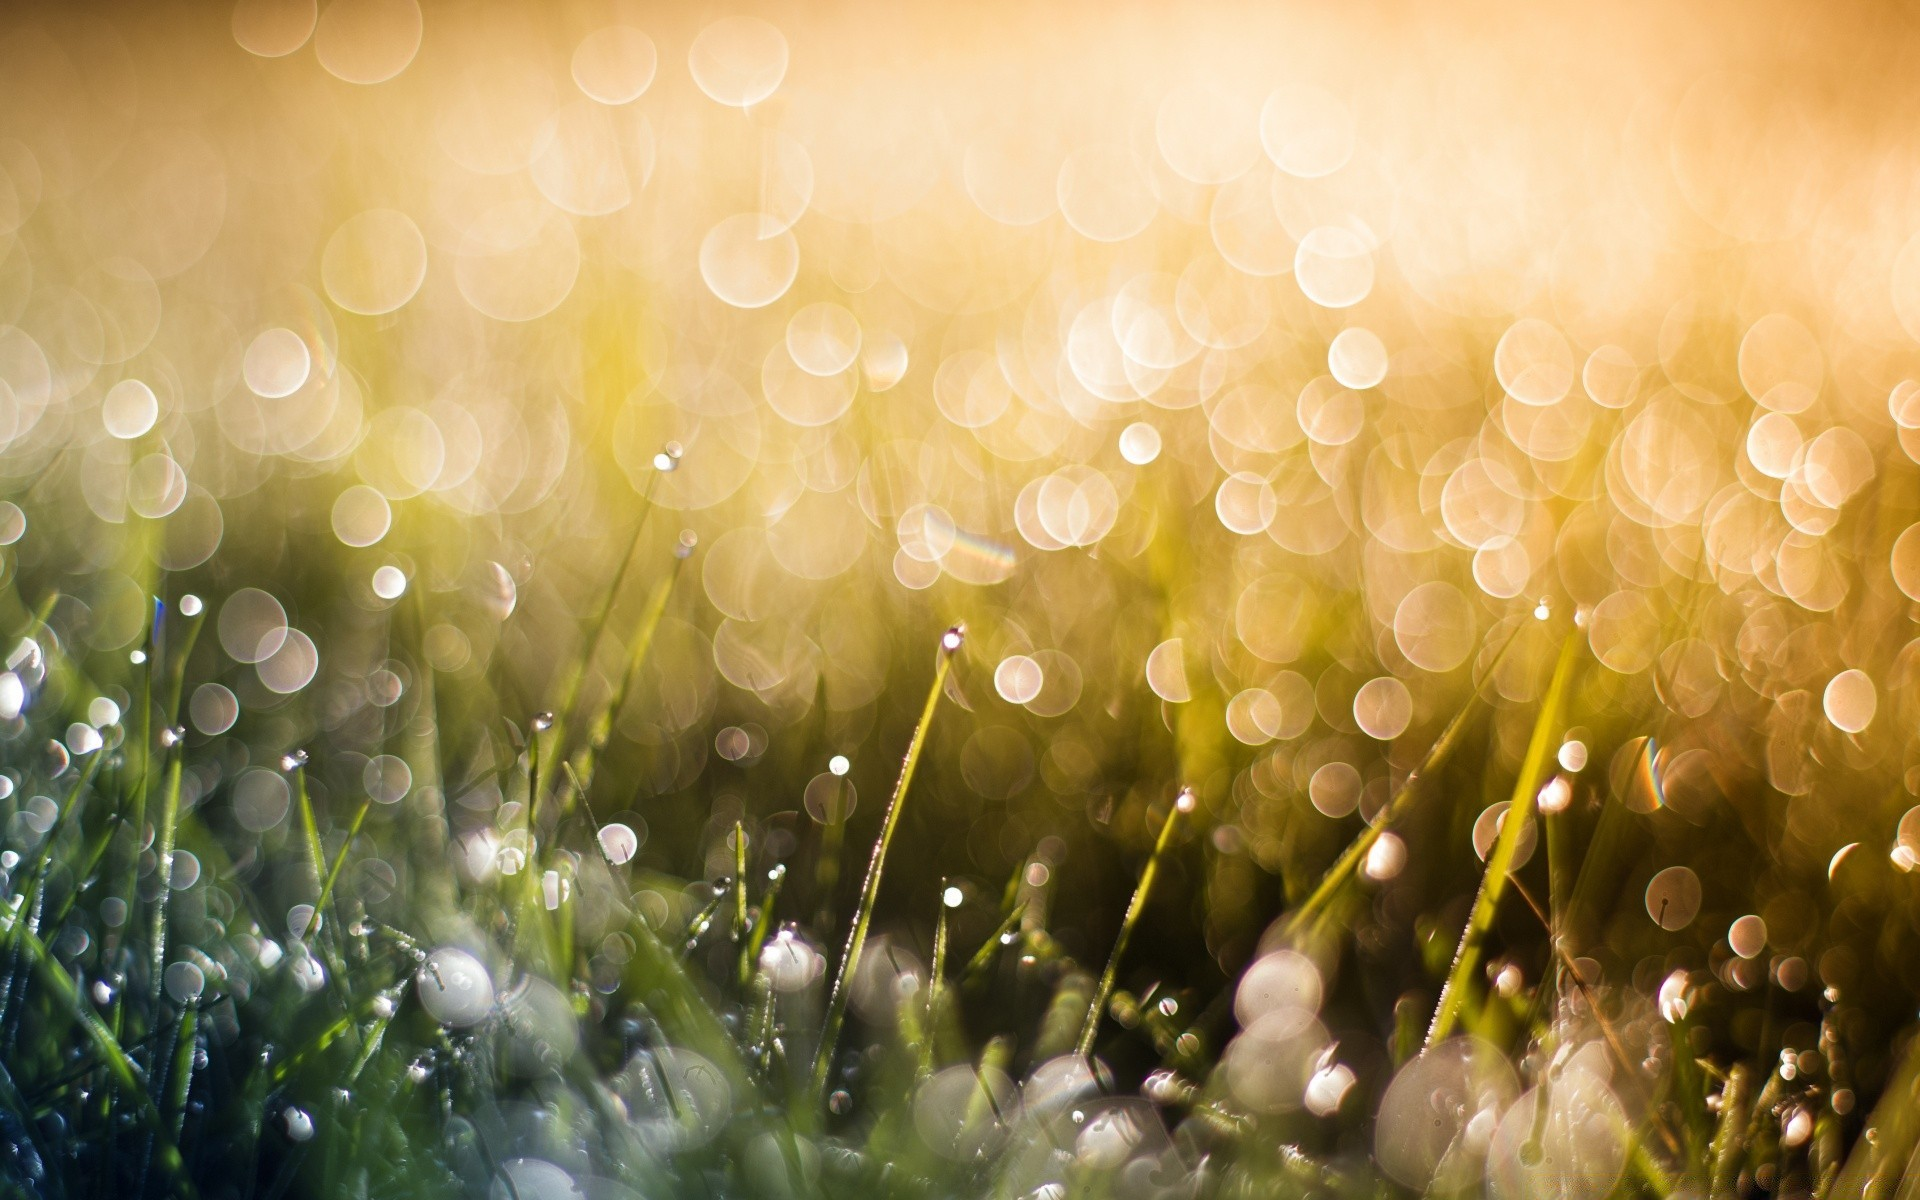 Bokeh Color Nature Desktop Bright Grass Blur Summer Luminescence Sun Season Flora Garden Christmas Shining Magic